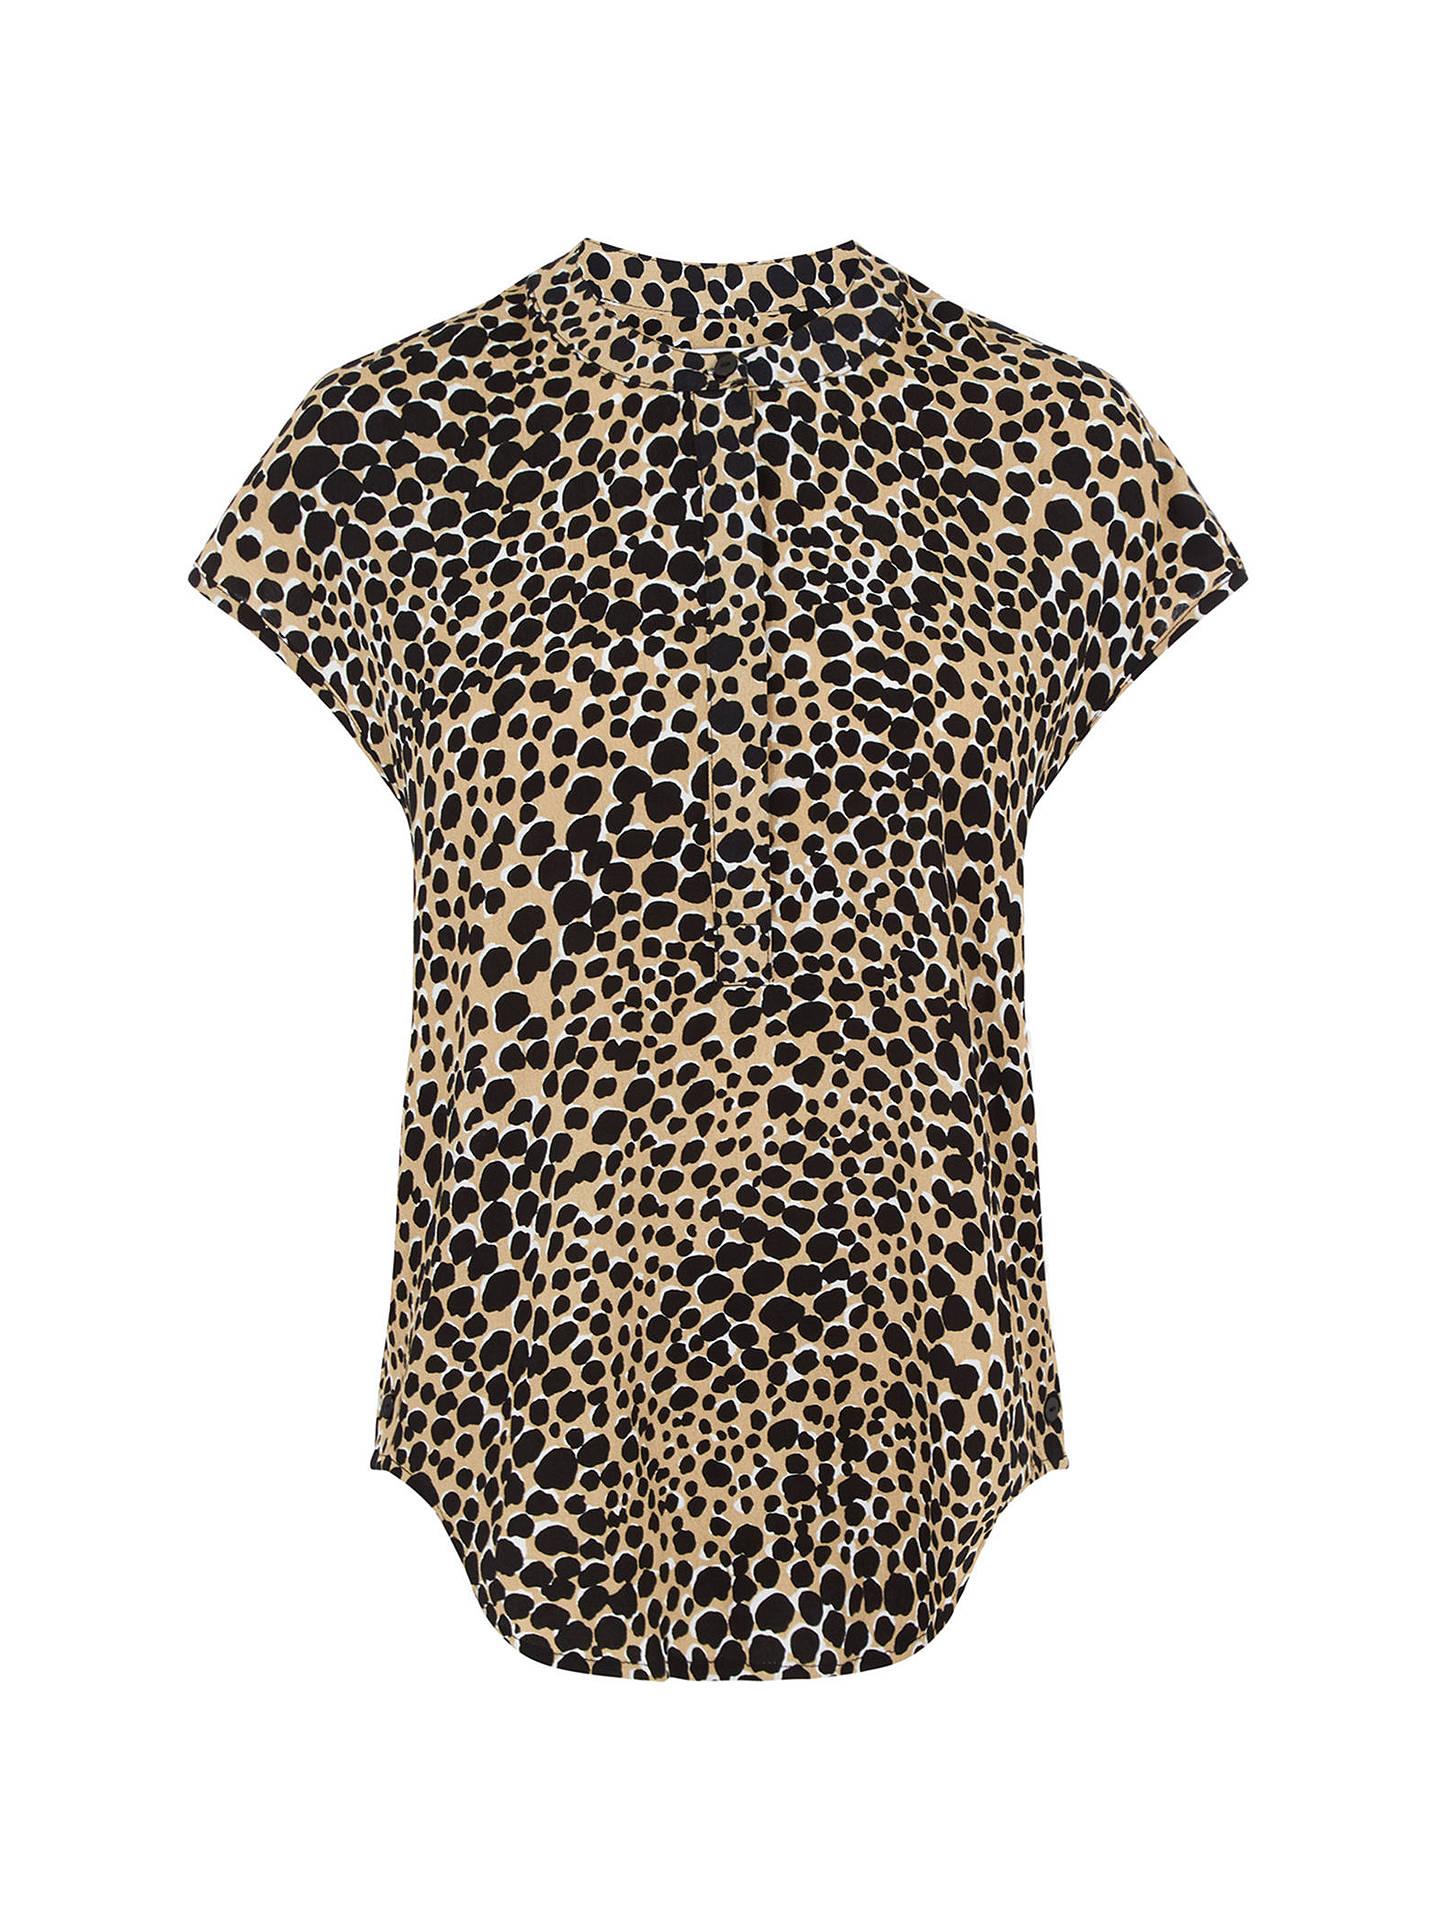 d64f0d8e76f4 ... Buy Warehouse Cheetah Print Blouse, Natural Stone, 6 Online at  johnlewis.com ...